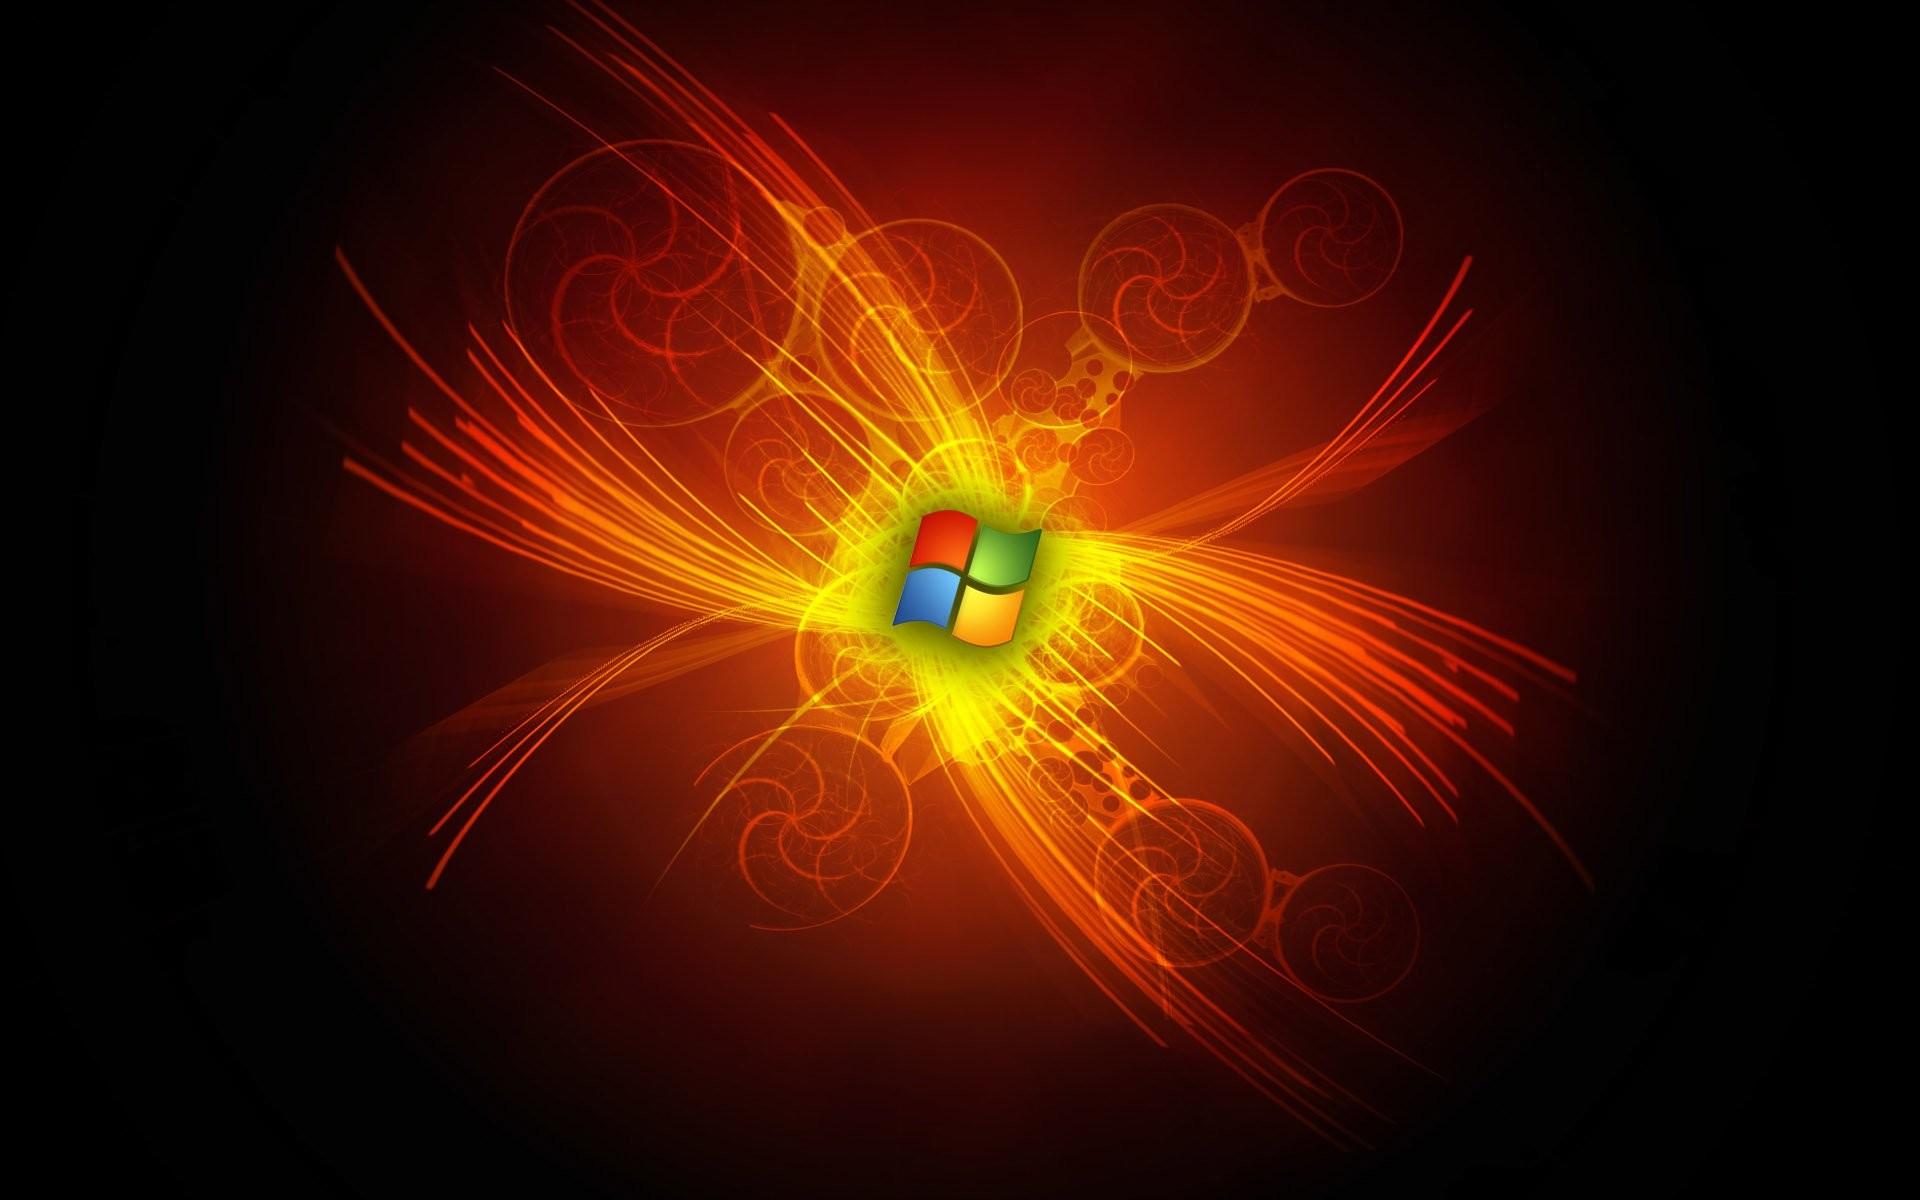 Microsoft freebies windows 7